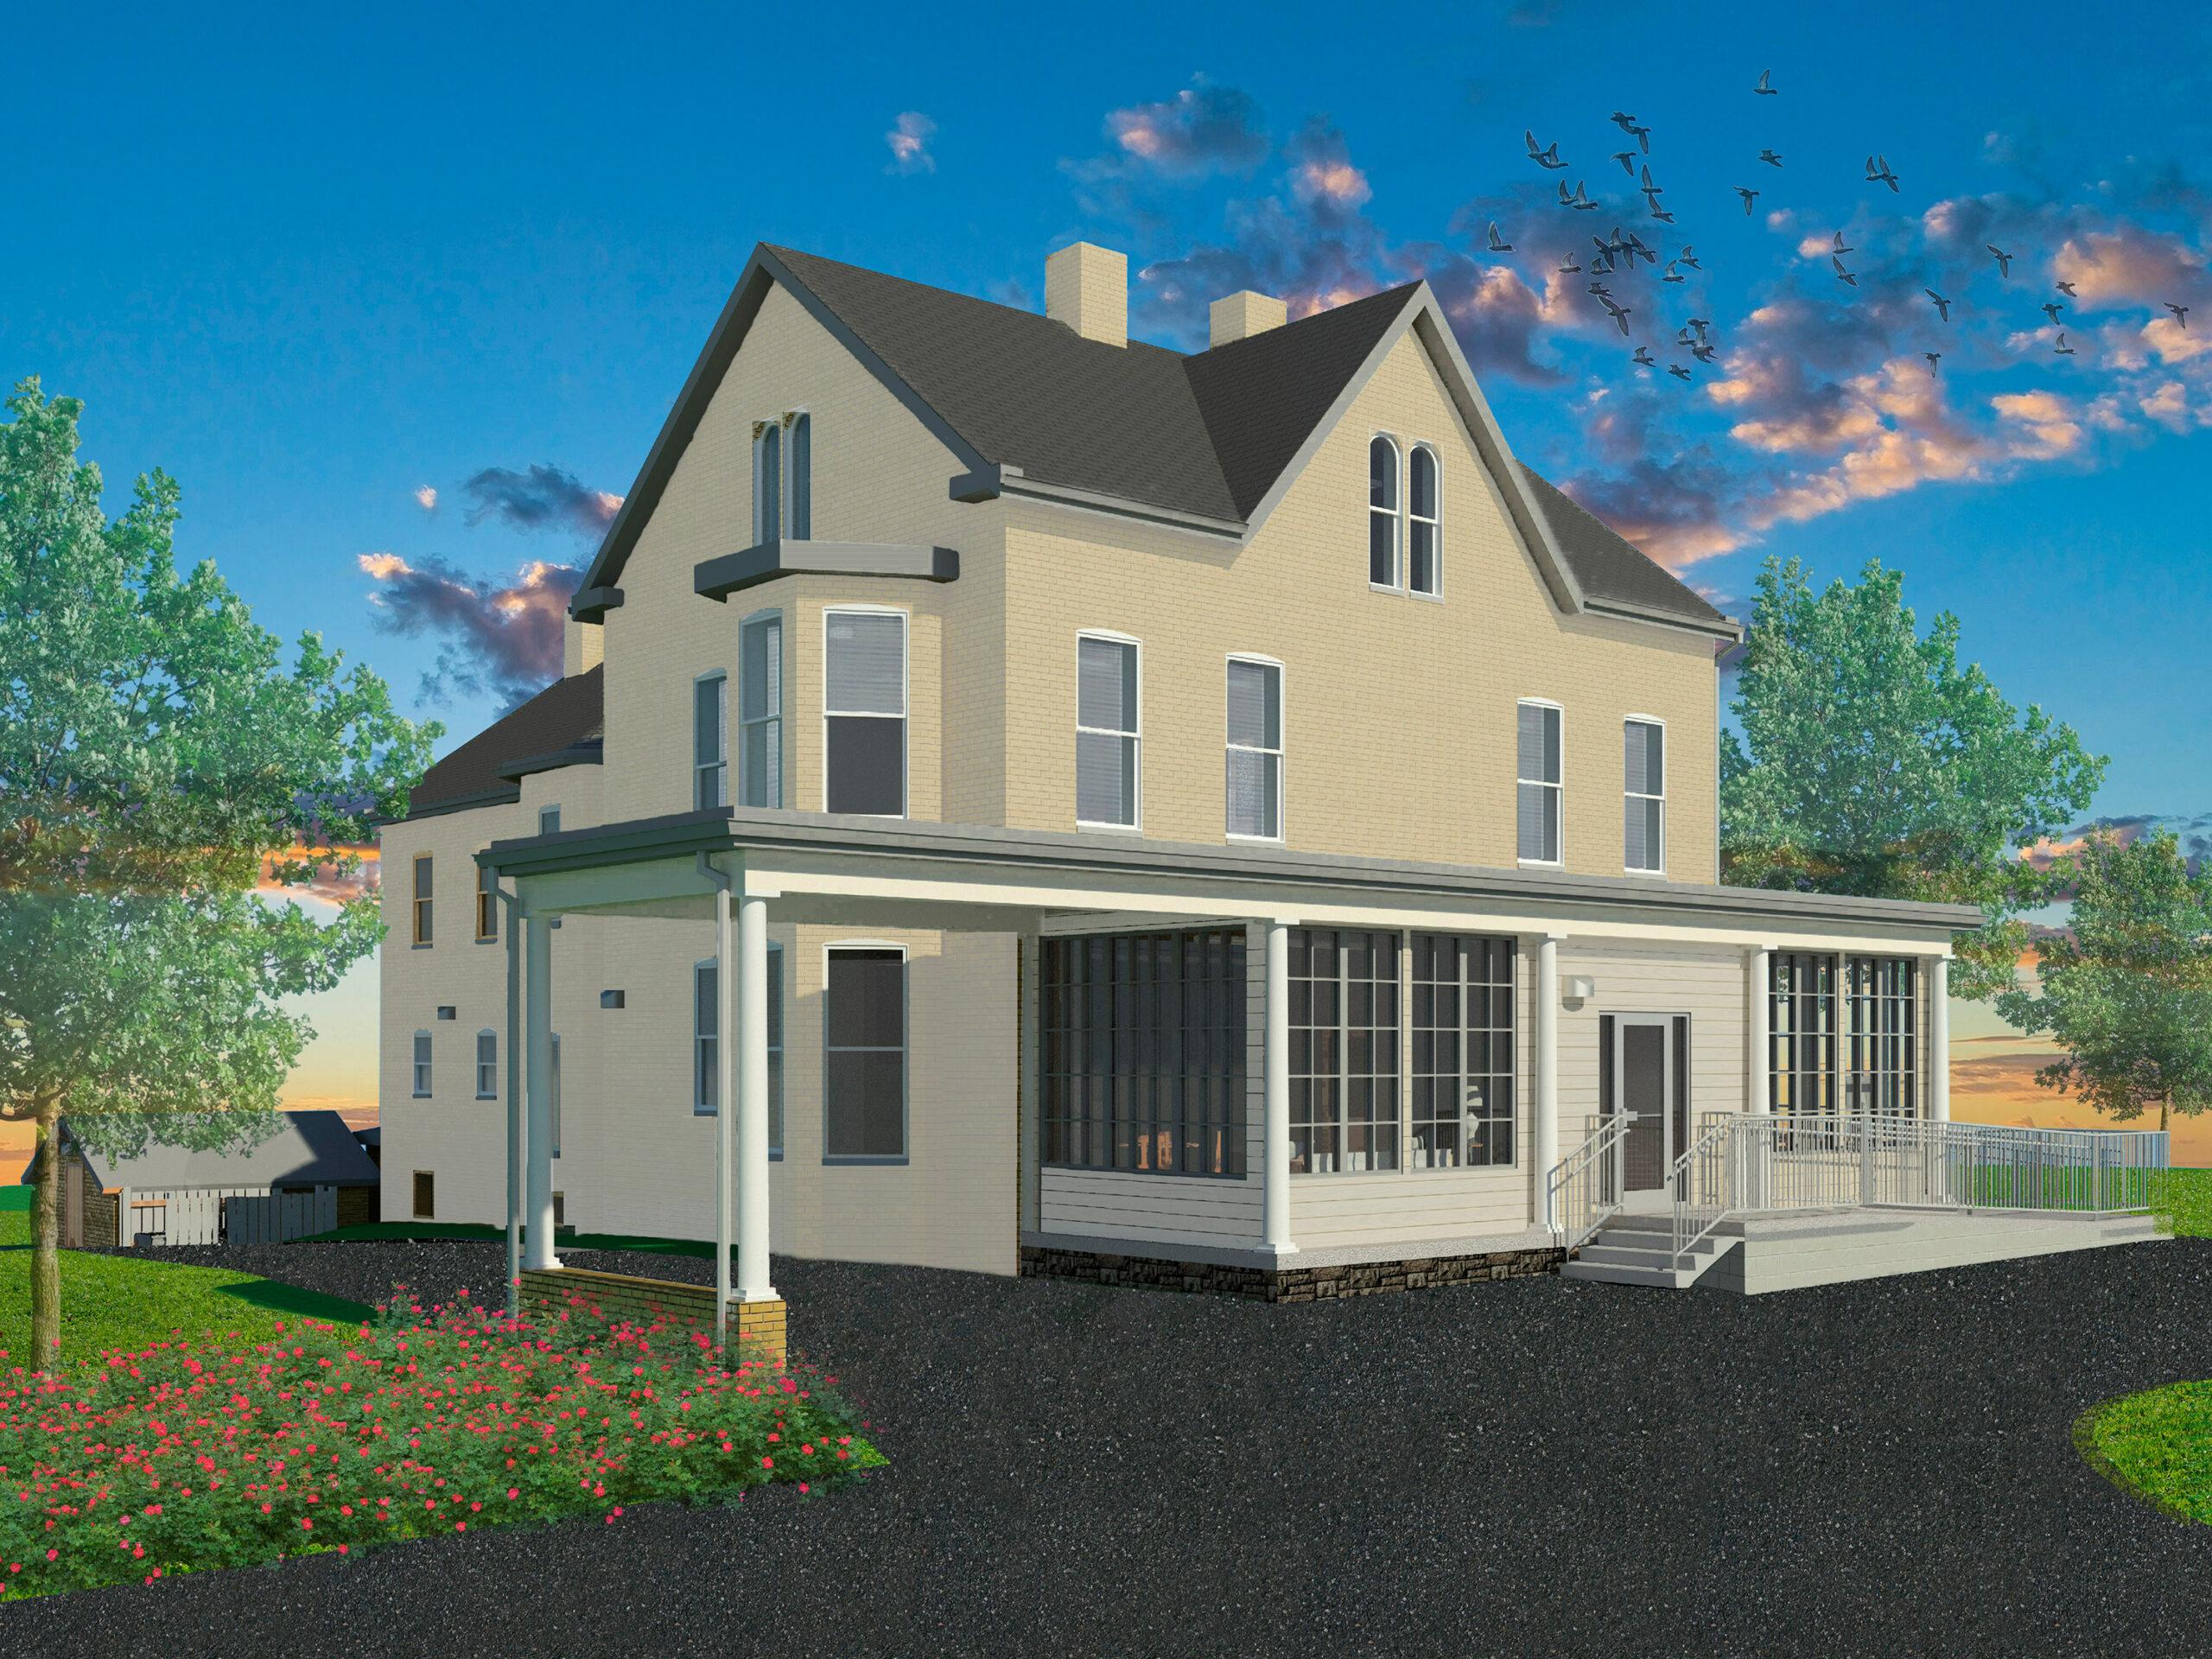 Hayward Farmhouse rendering